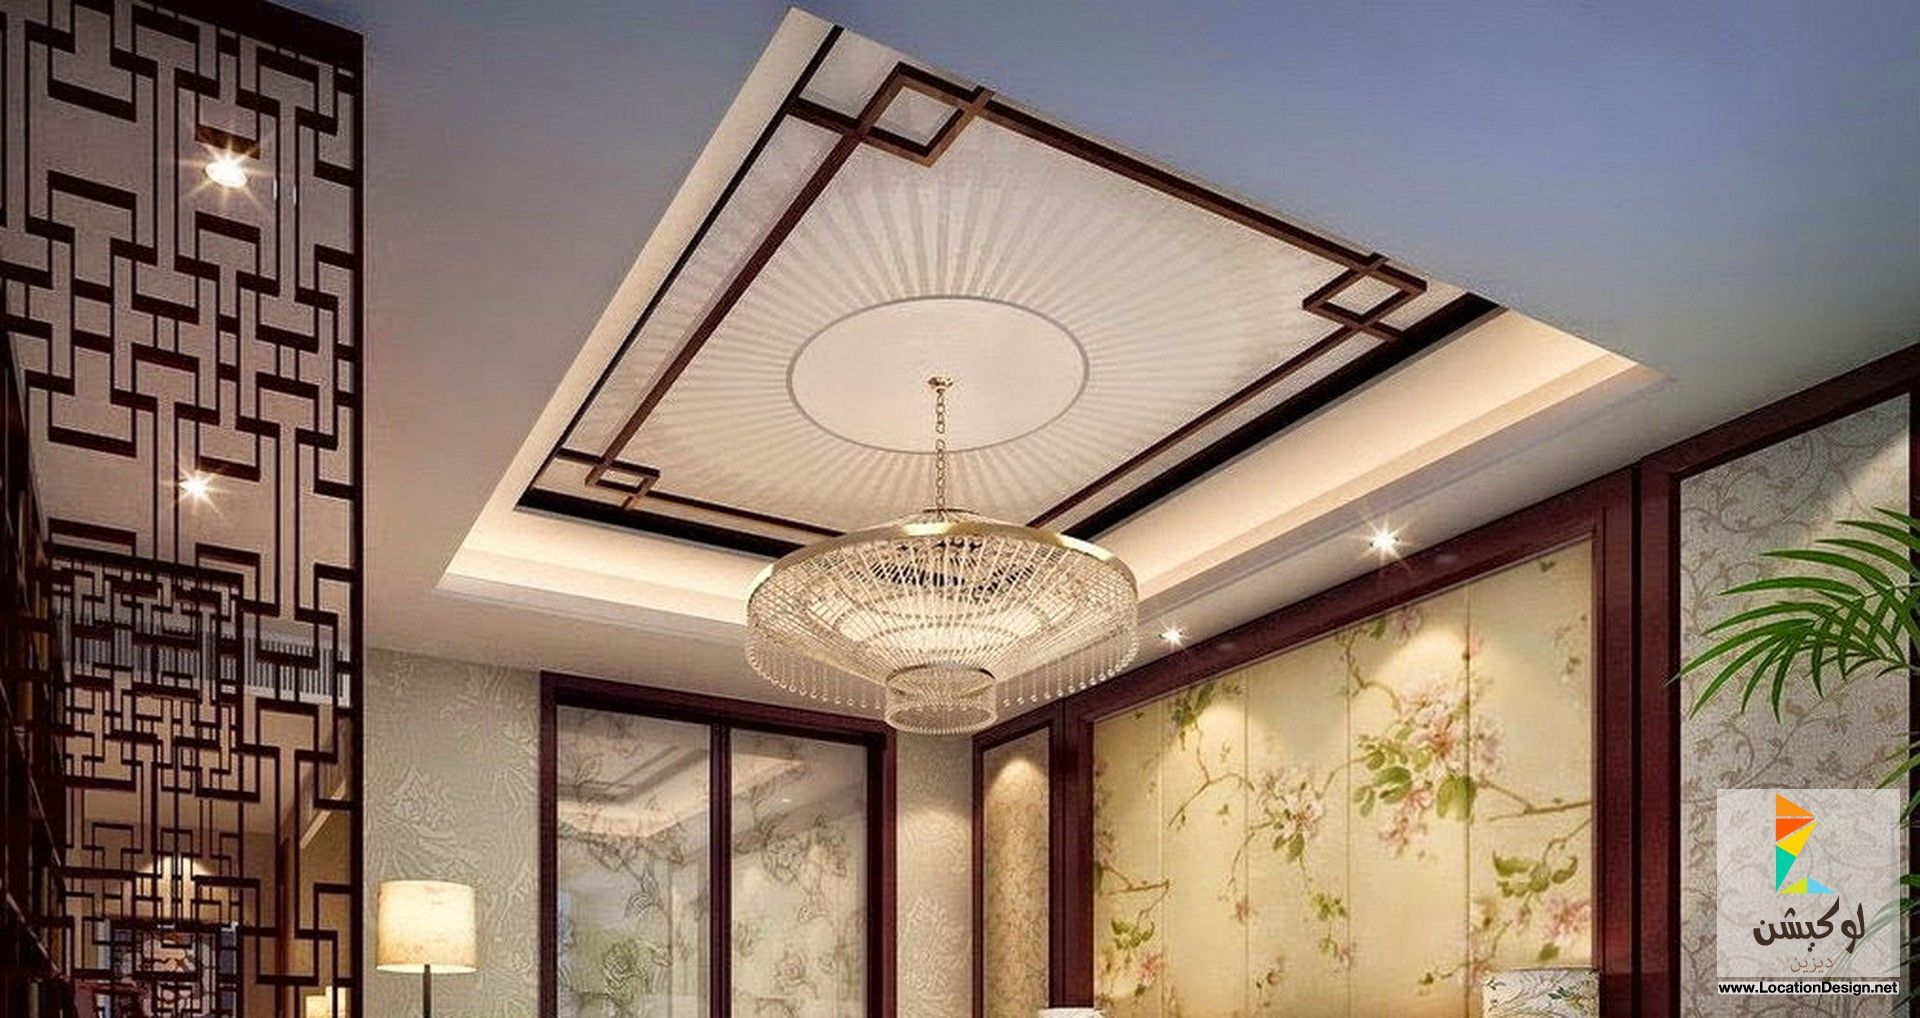 Plaster Of Paris Ceiling Designs For Living Room